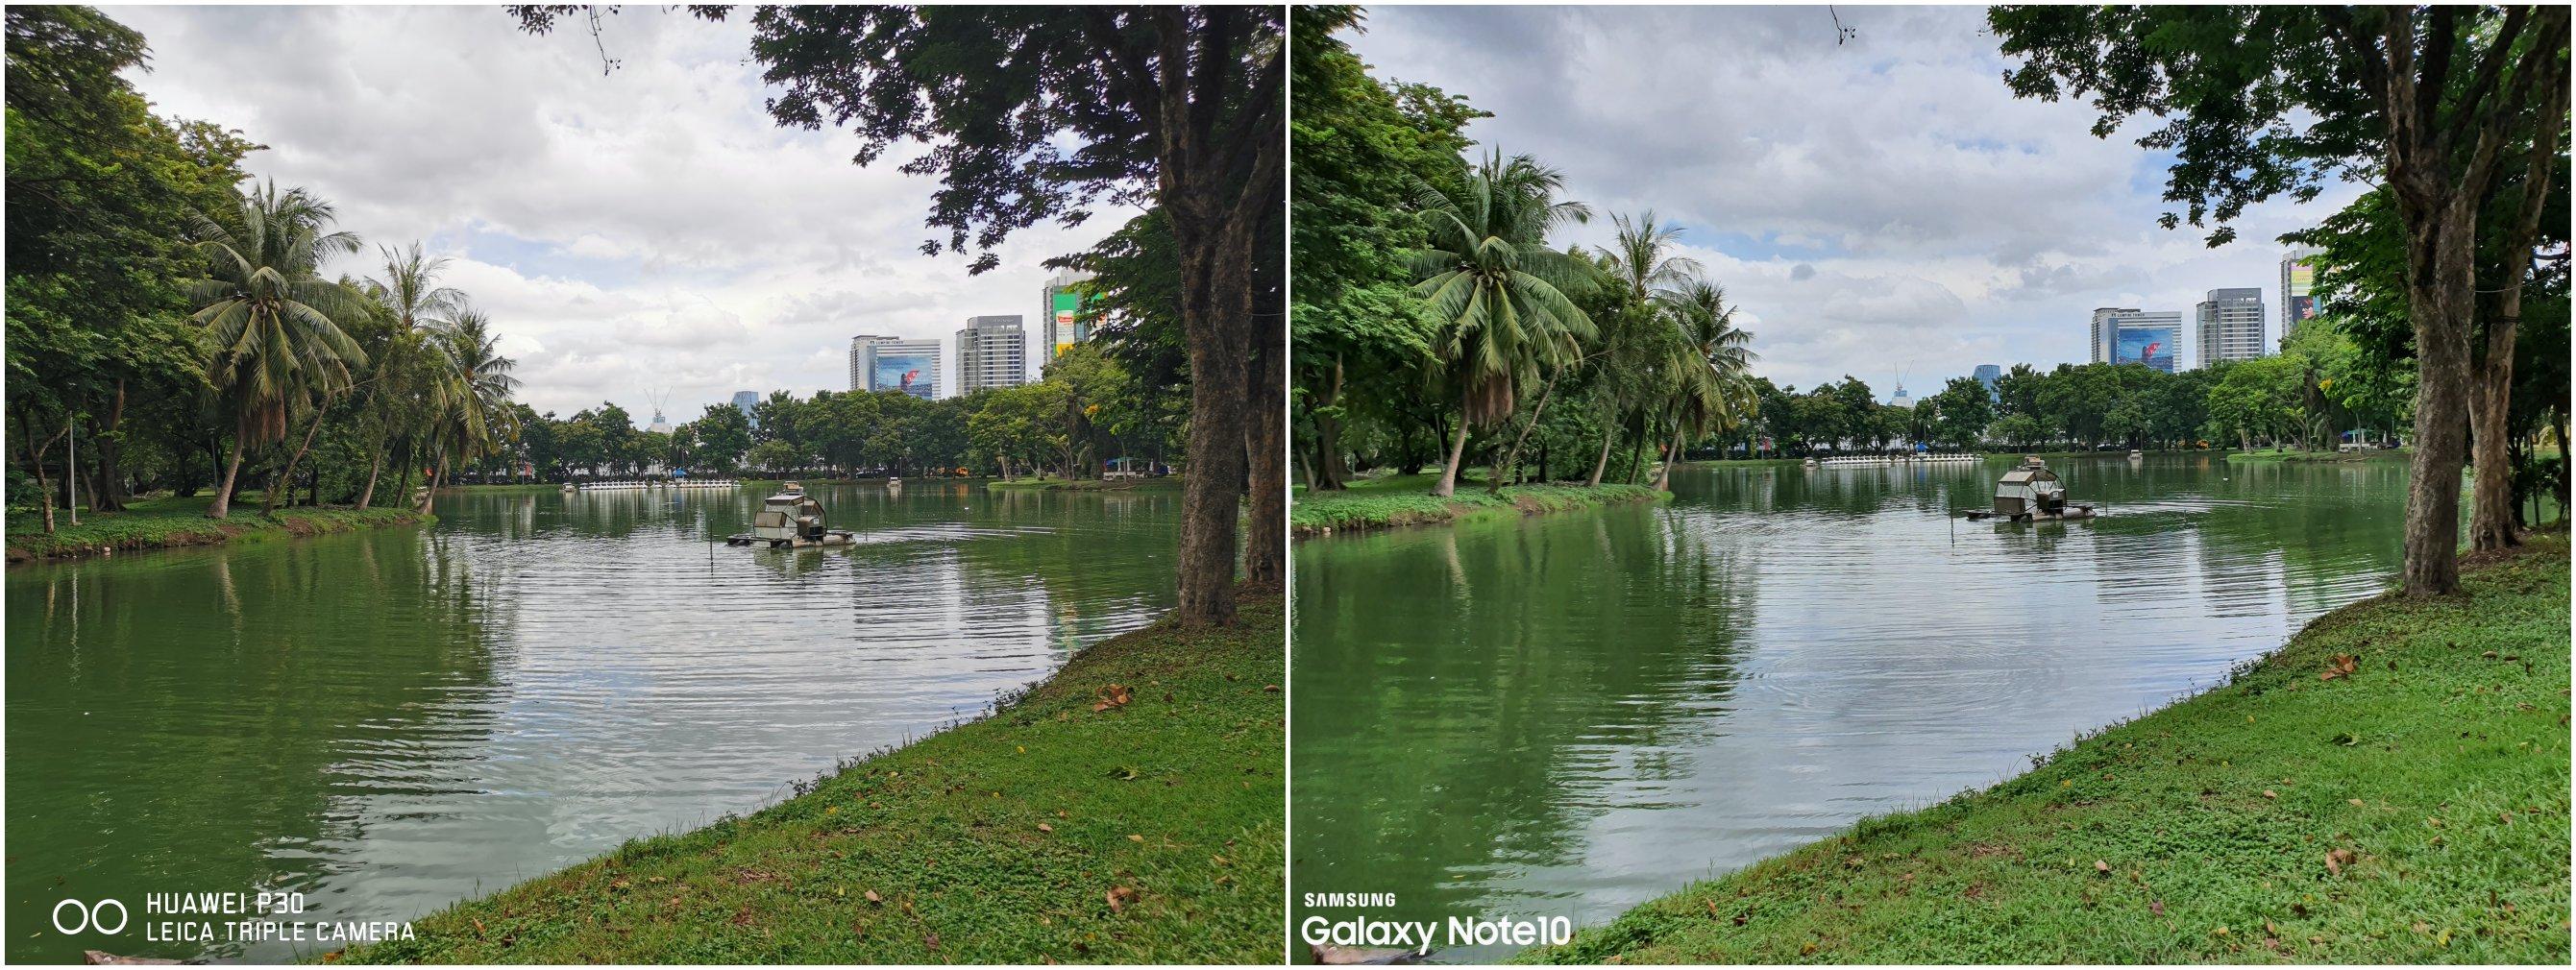 Camera Battle Galaxy Note 10 vs HUAWEI P30 SpecPhone 0001